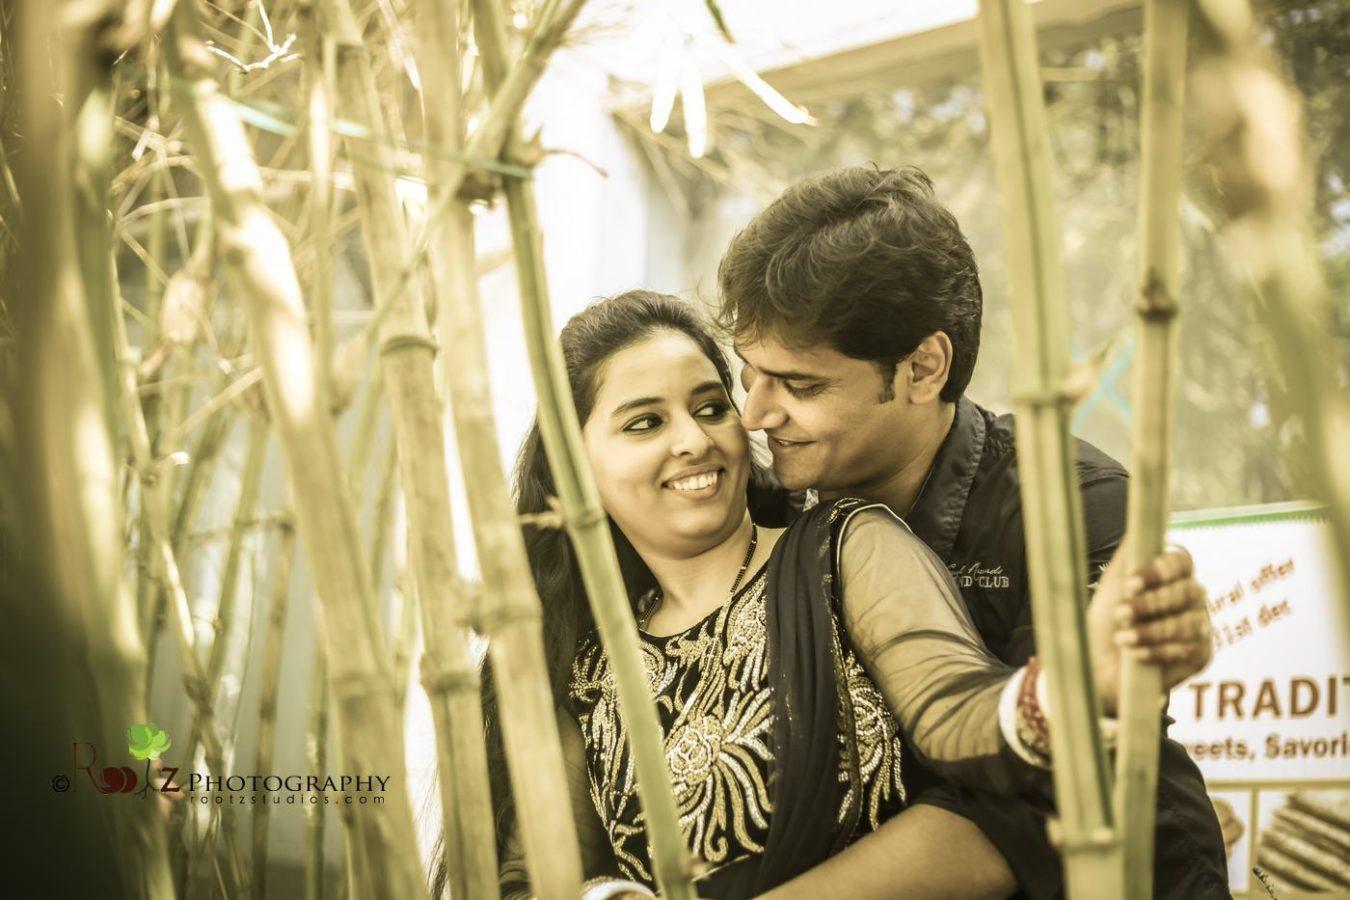 Vaseem sultana - Khaleel ur rehman Chennai - Rootz Photography 11